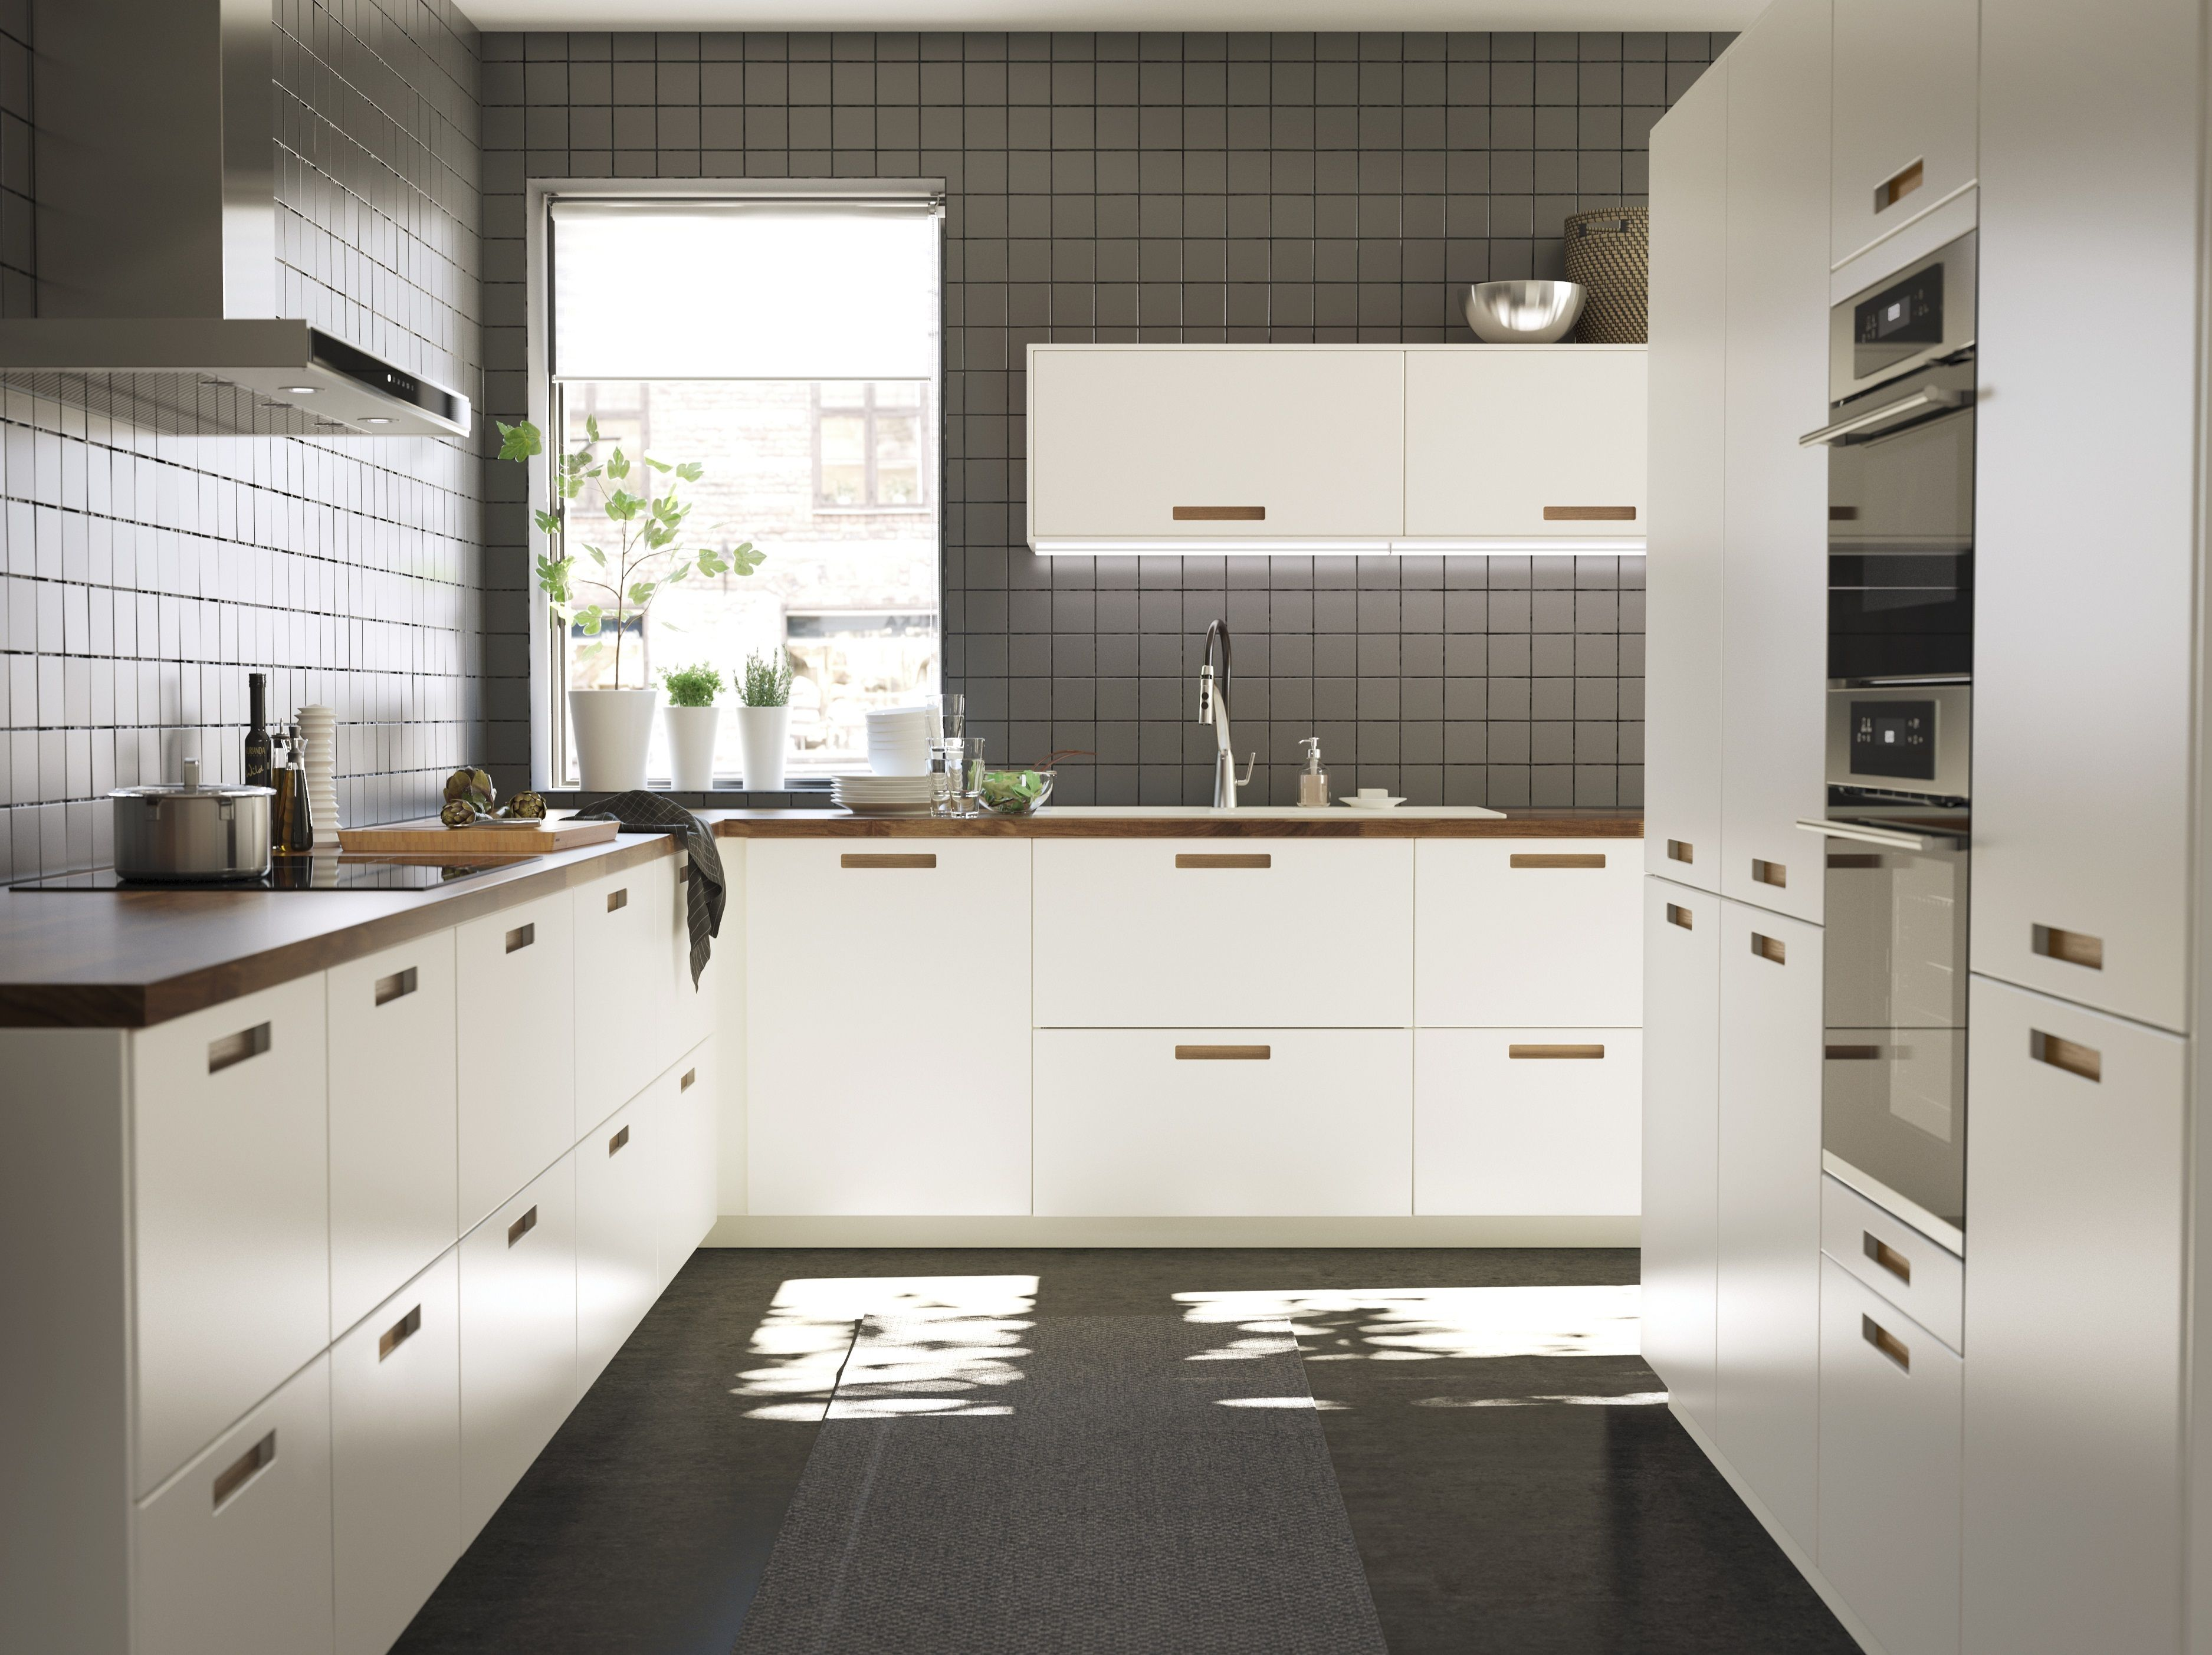 Diy Keuken Ikea : Metod keuken ikea ikeanl gastronomisch wit bruin